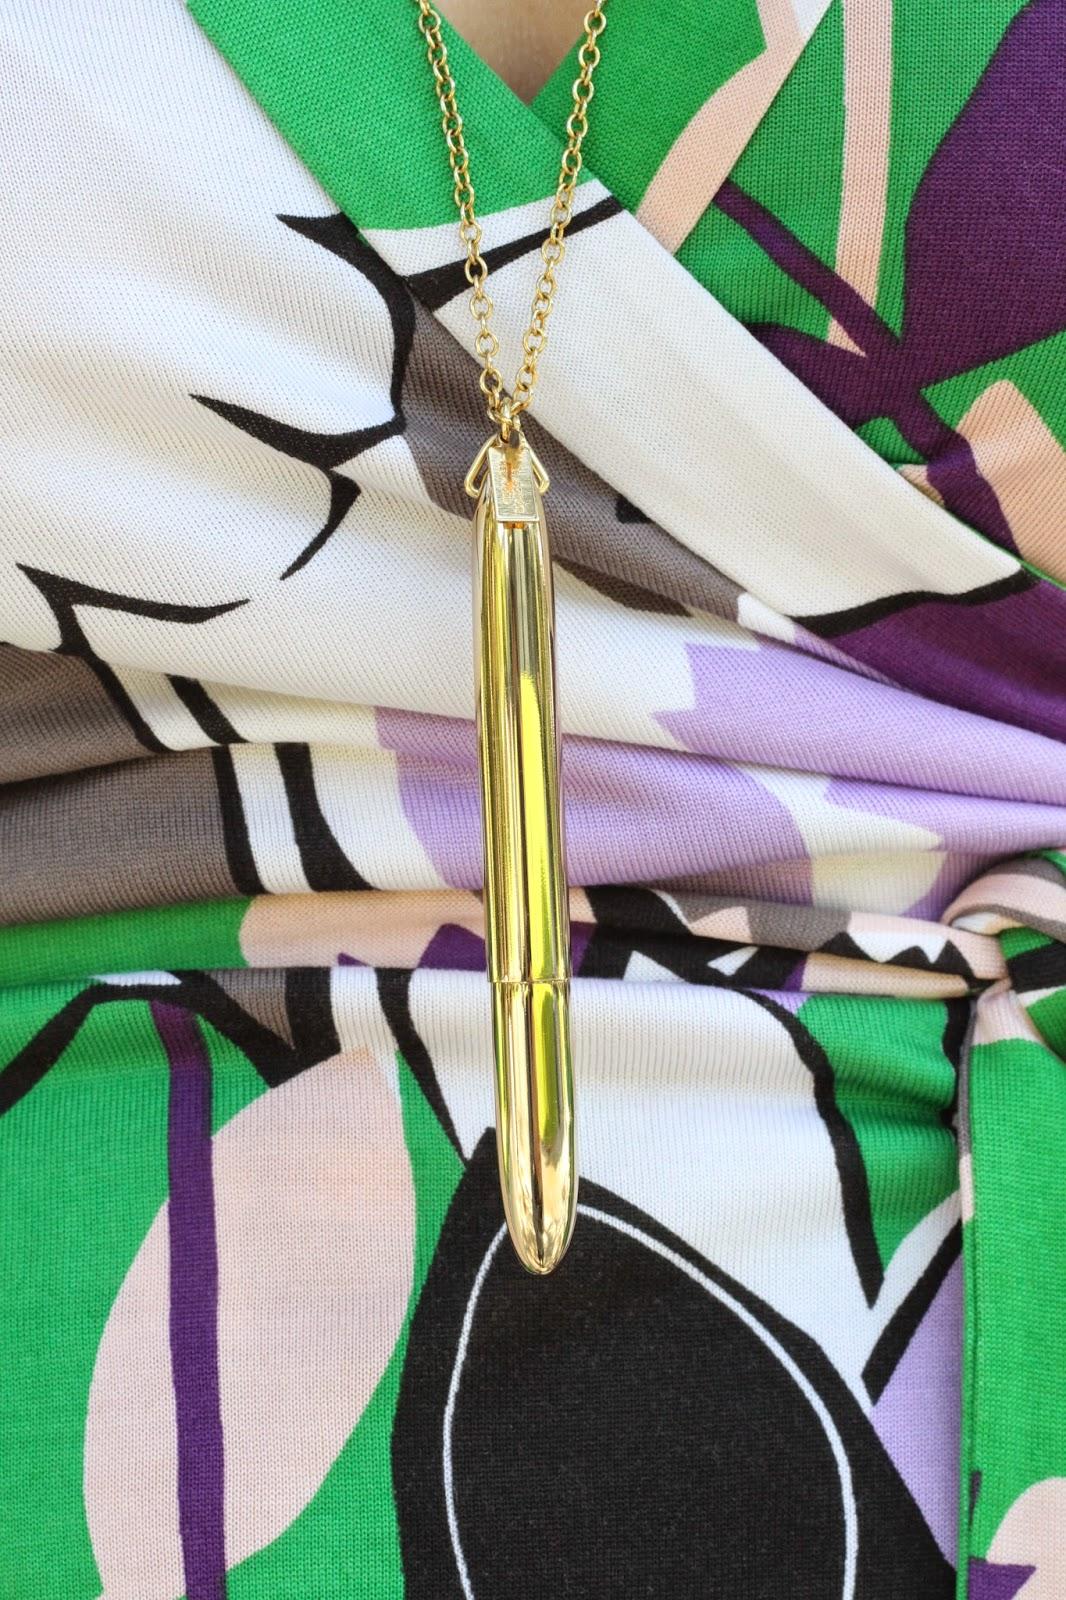 Kate Spade Pen Necklace